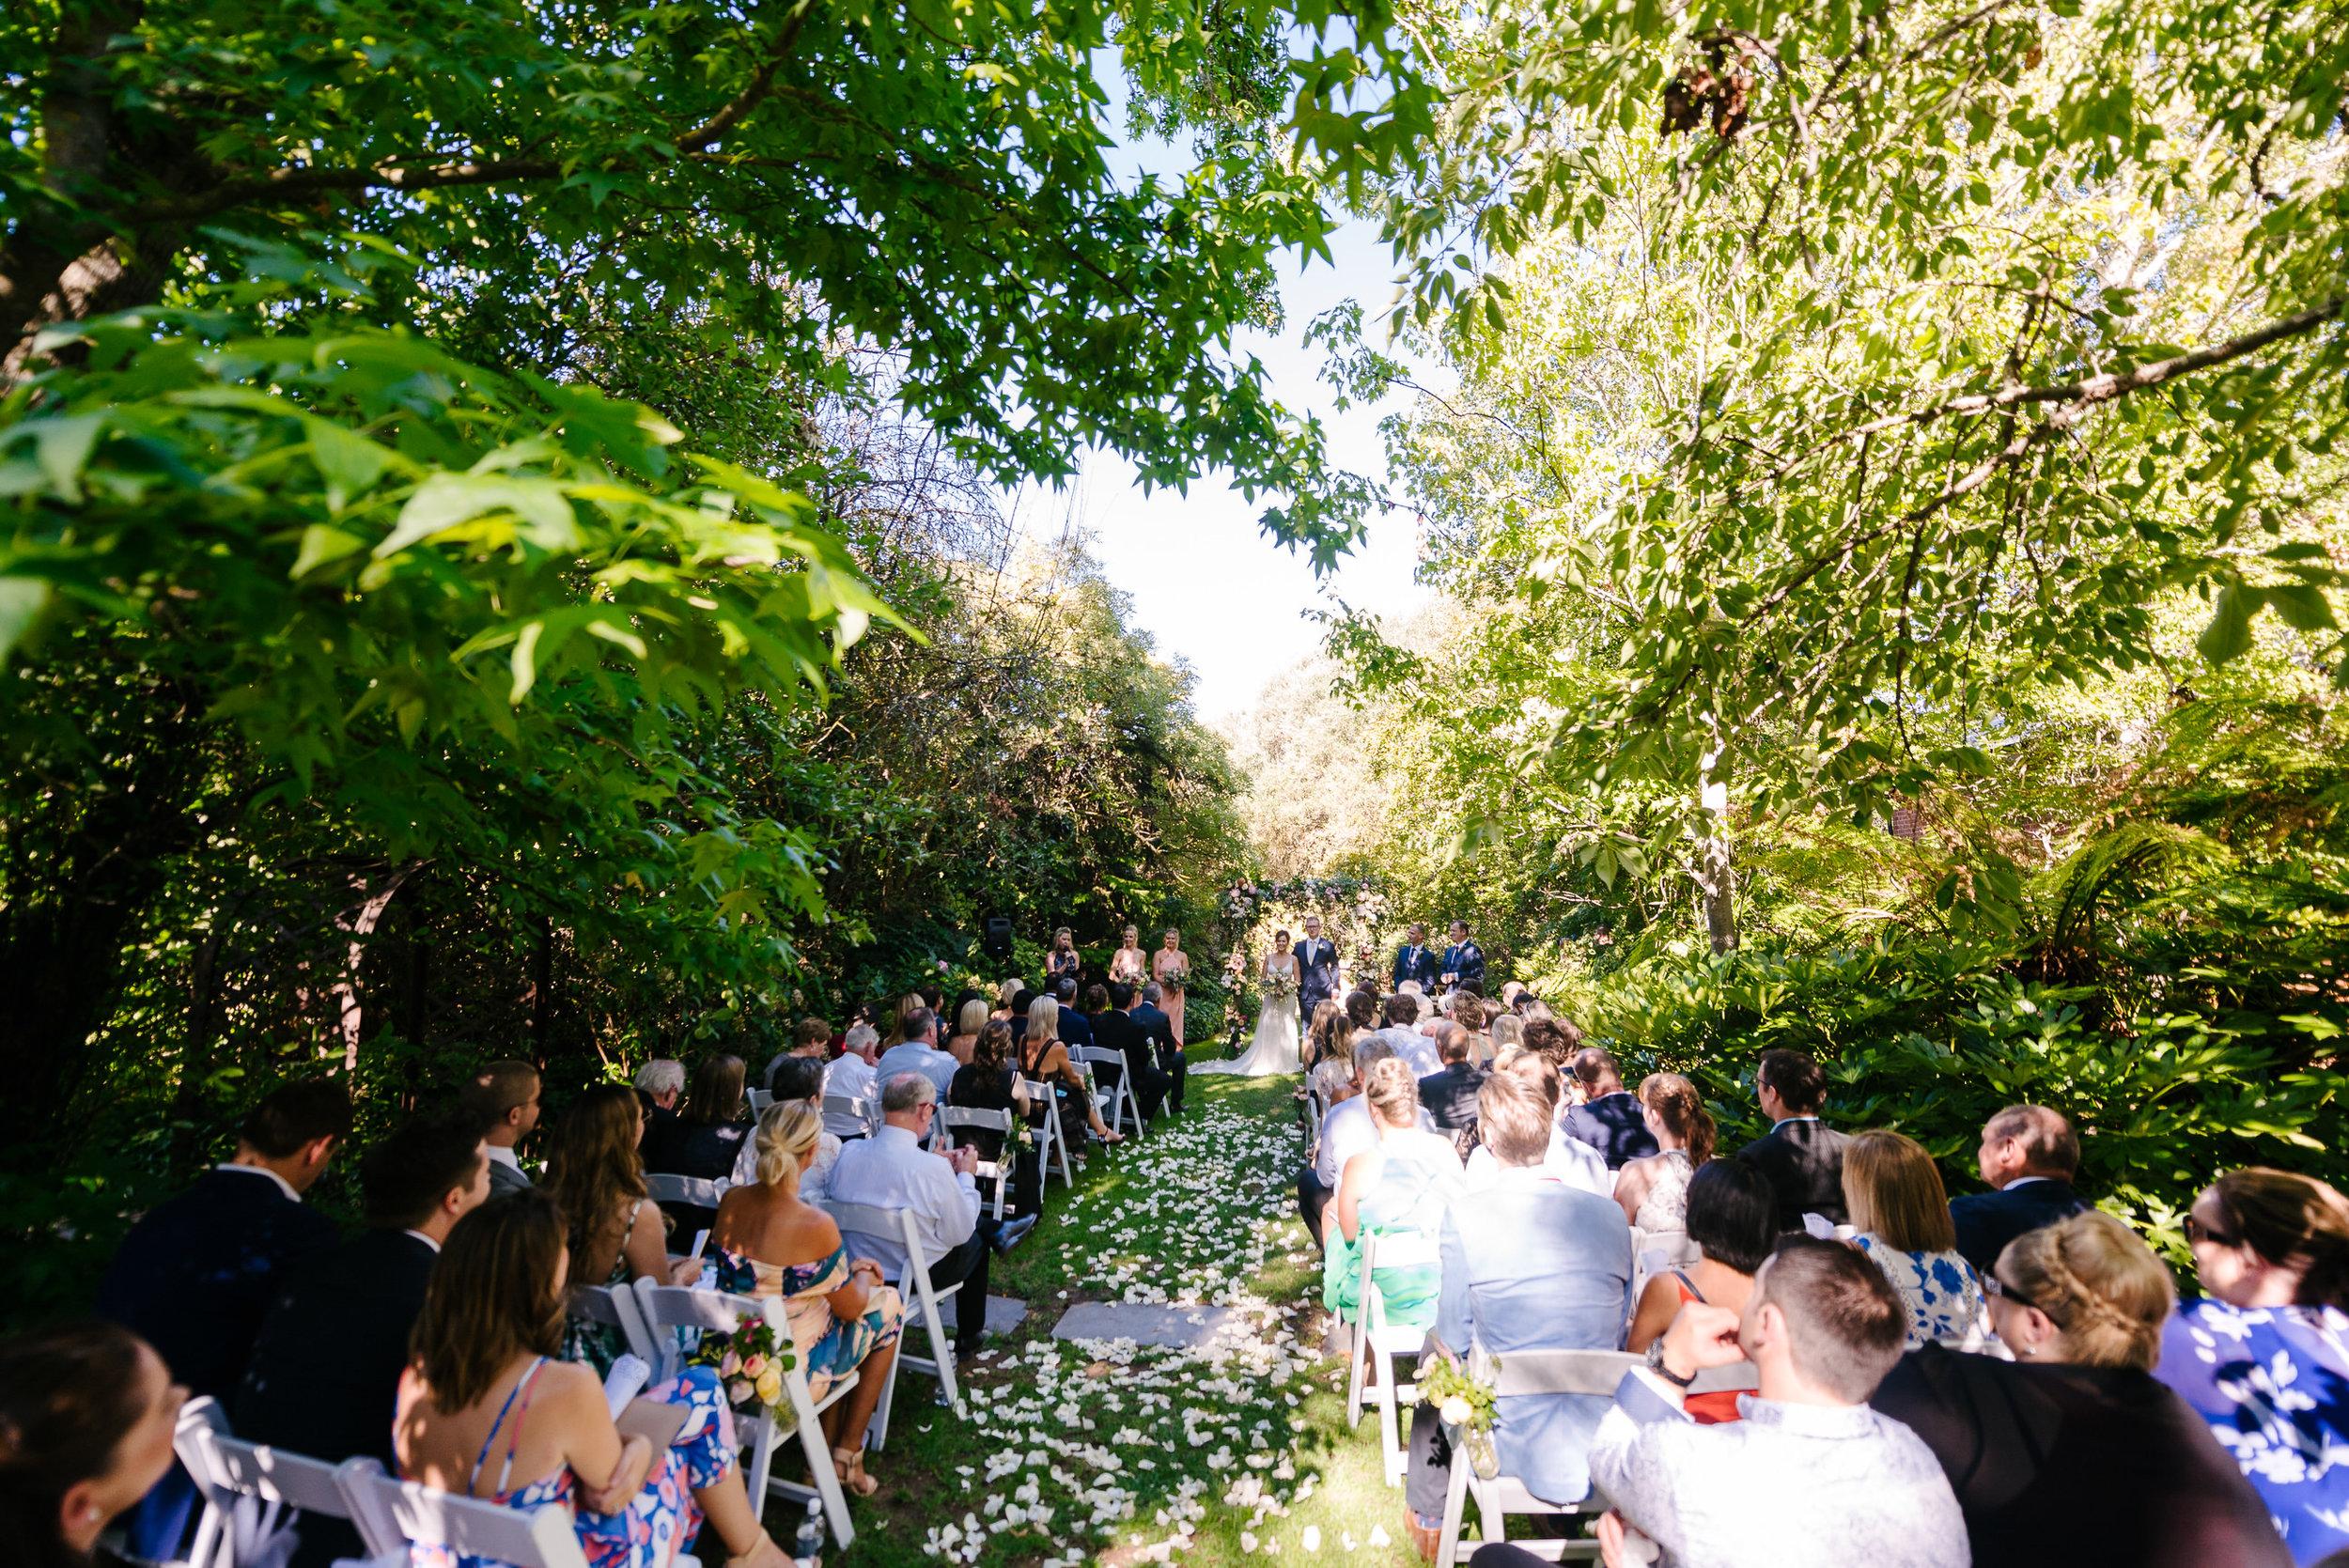 Justin_And_Jim_Photography_Chateau_Dore_Bendigo_Wedding38.JPG